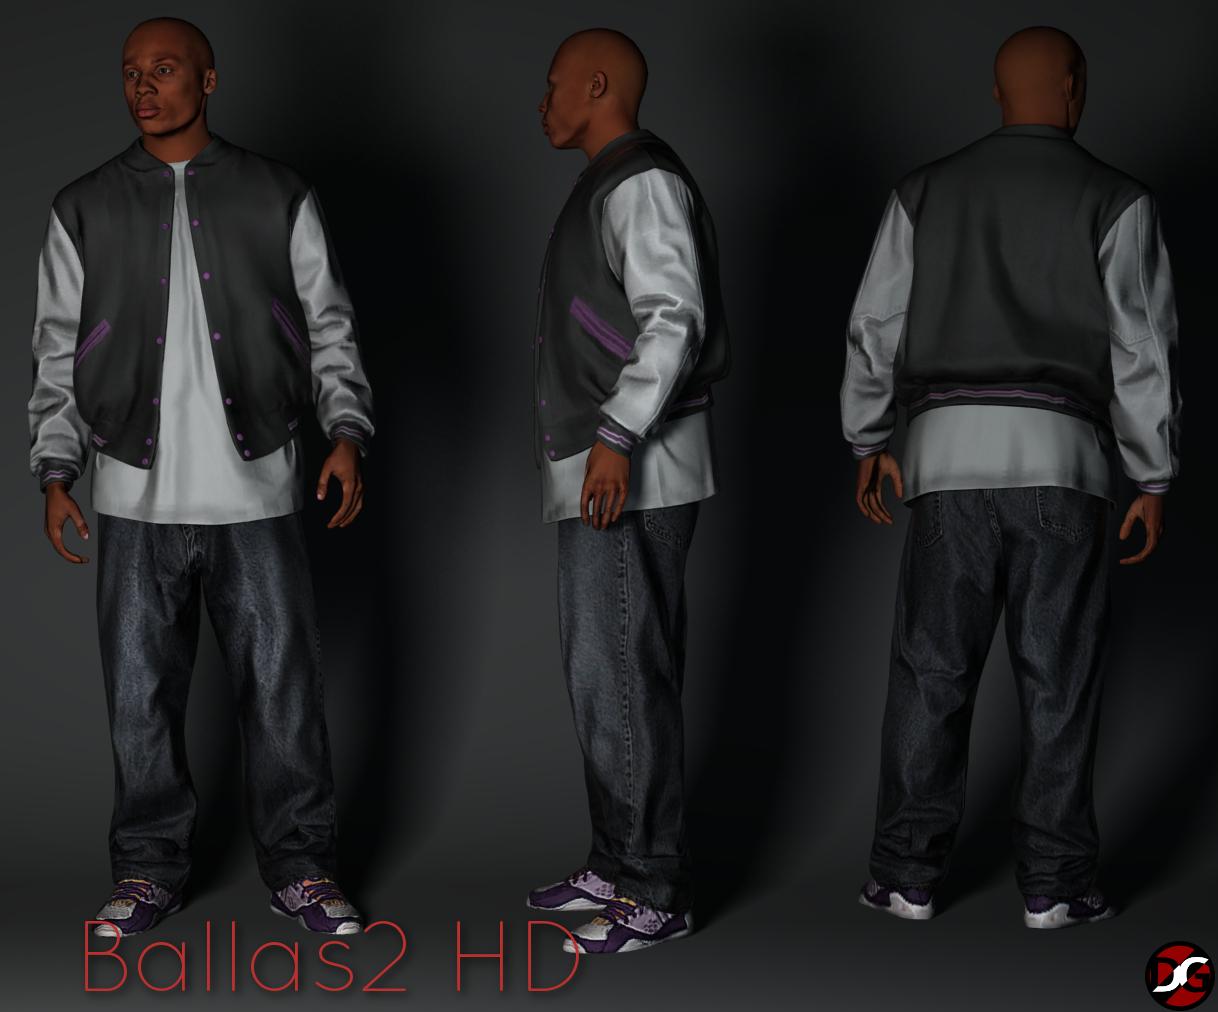 Ballas2 HD gta 0